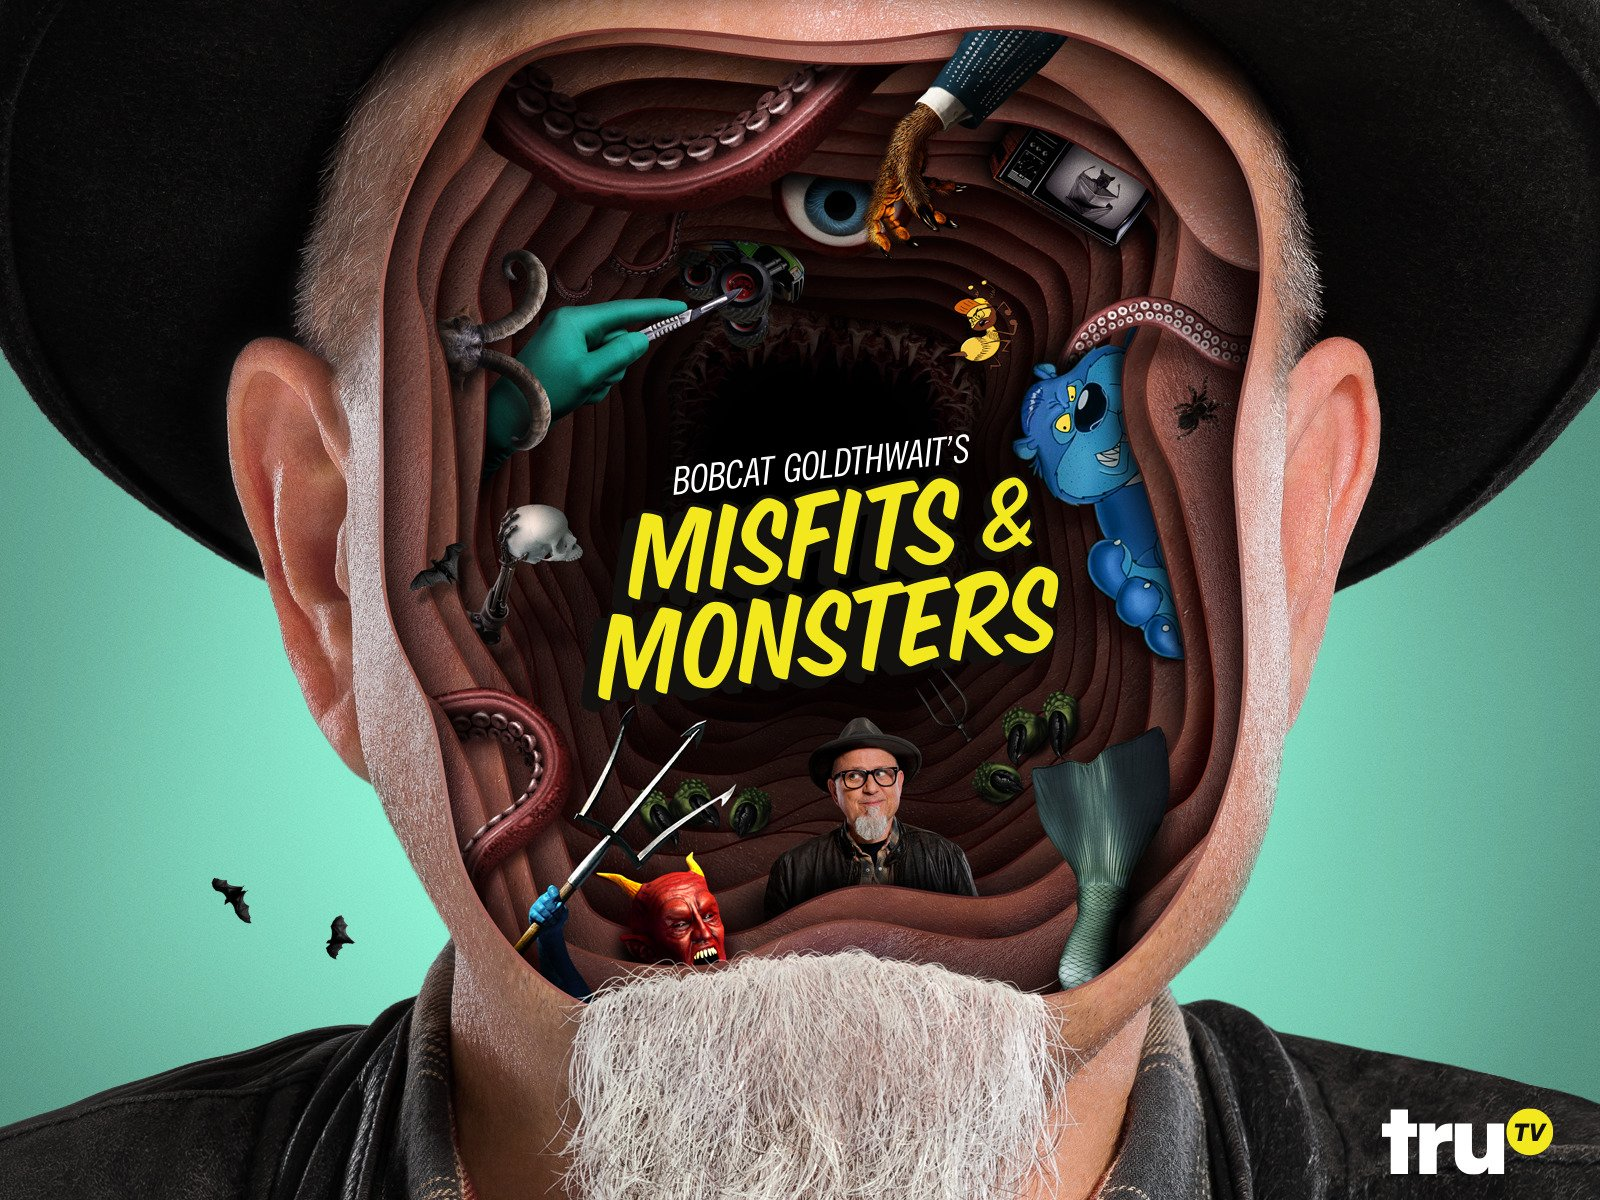 bobcat goldthwaits misfits & monsters subtitles